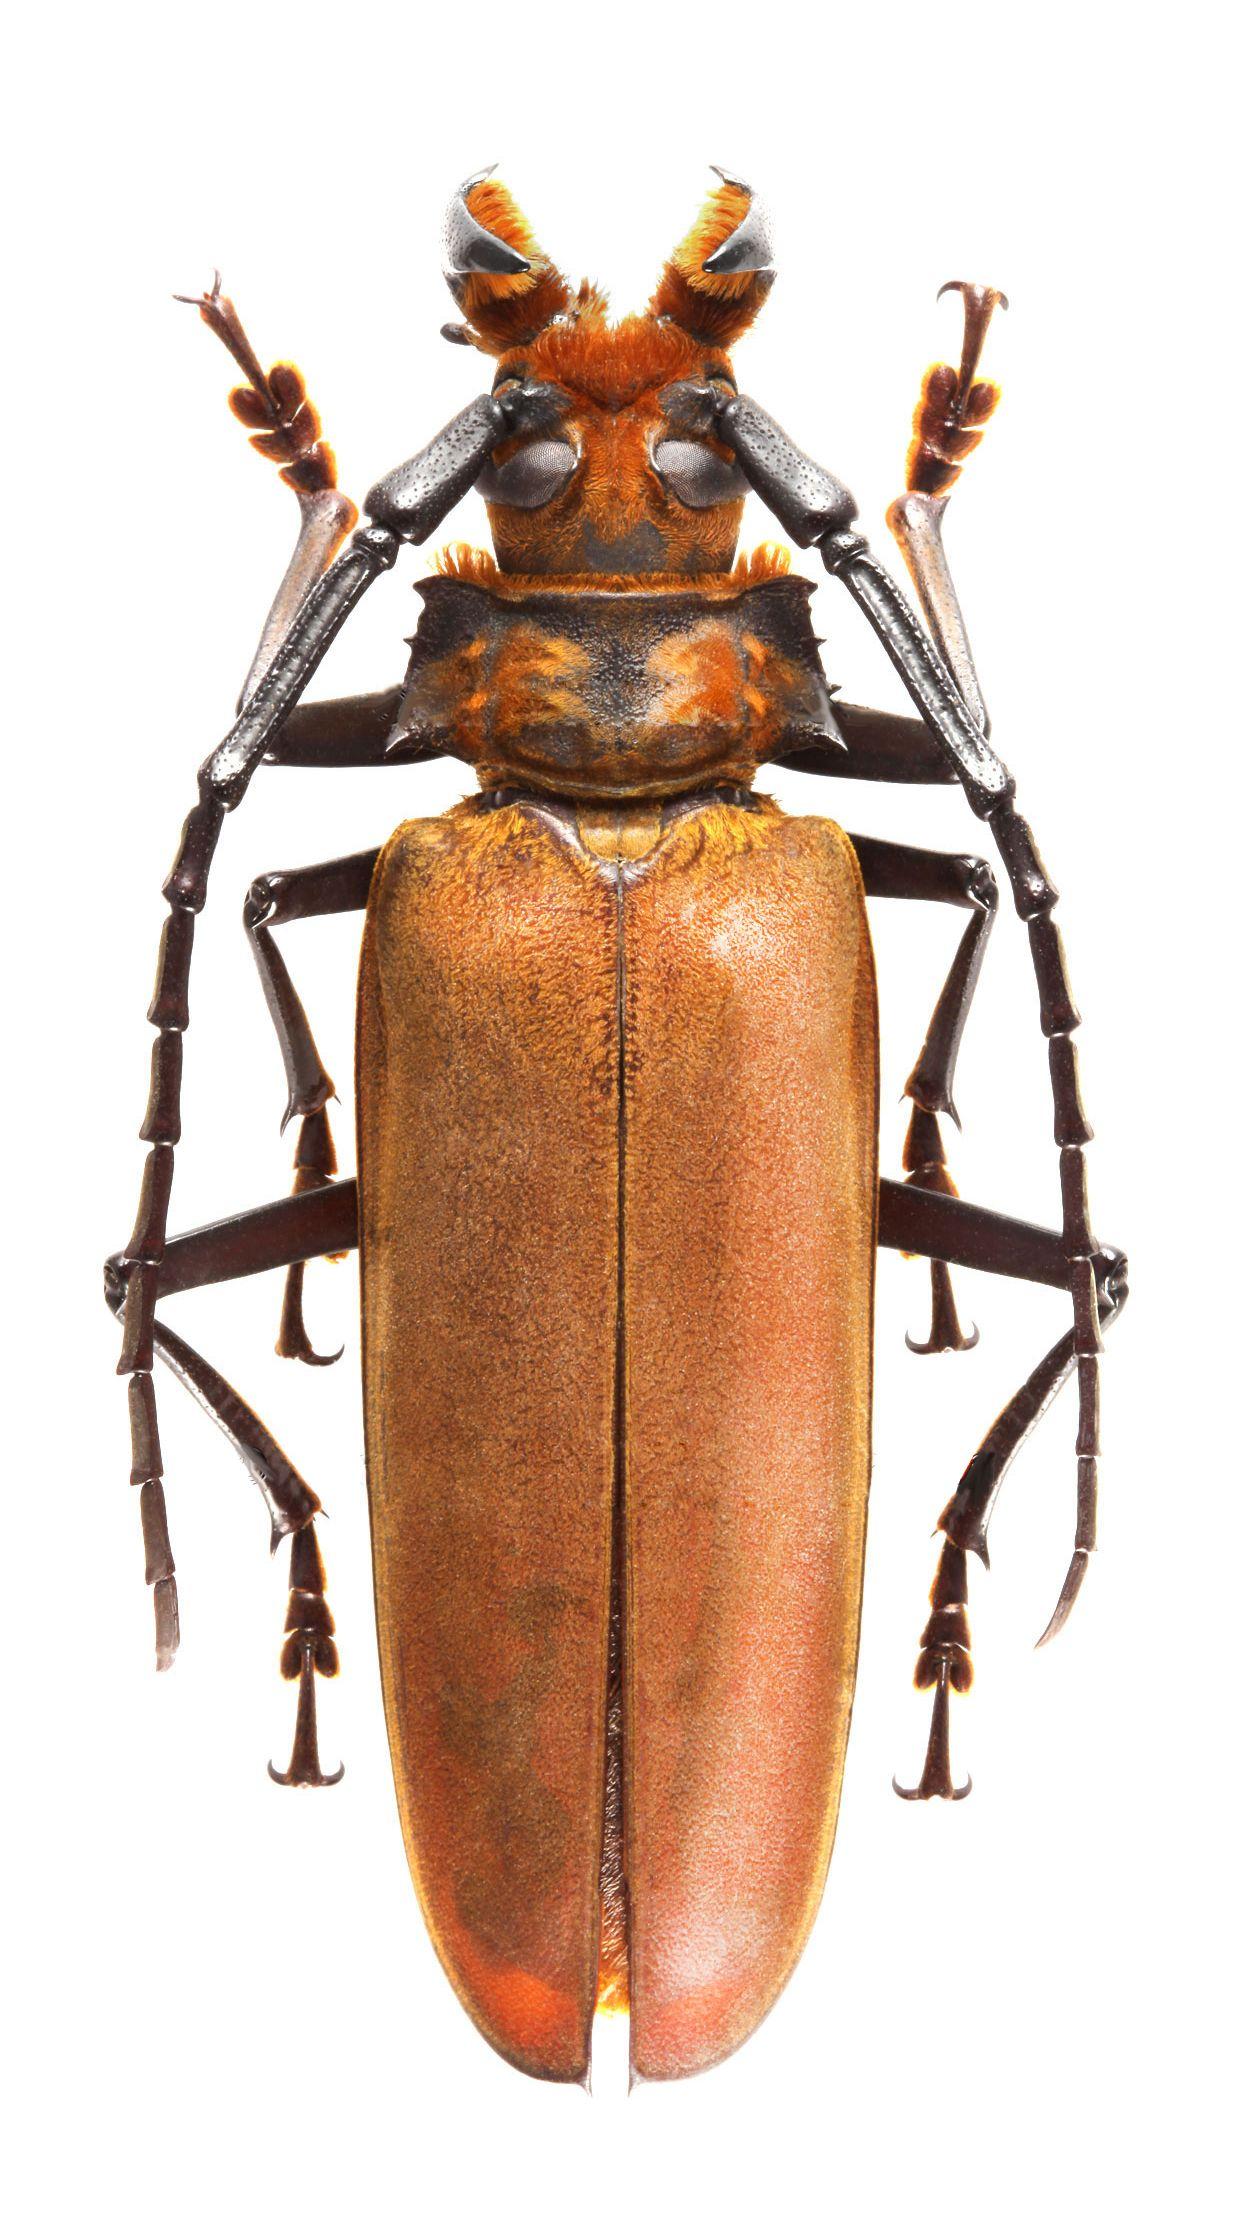 Callipogon (Orthomegas) fragosoi | Beetles - Longhorn | Pinterest ...